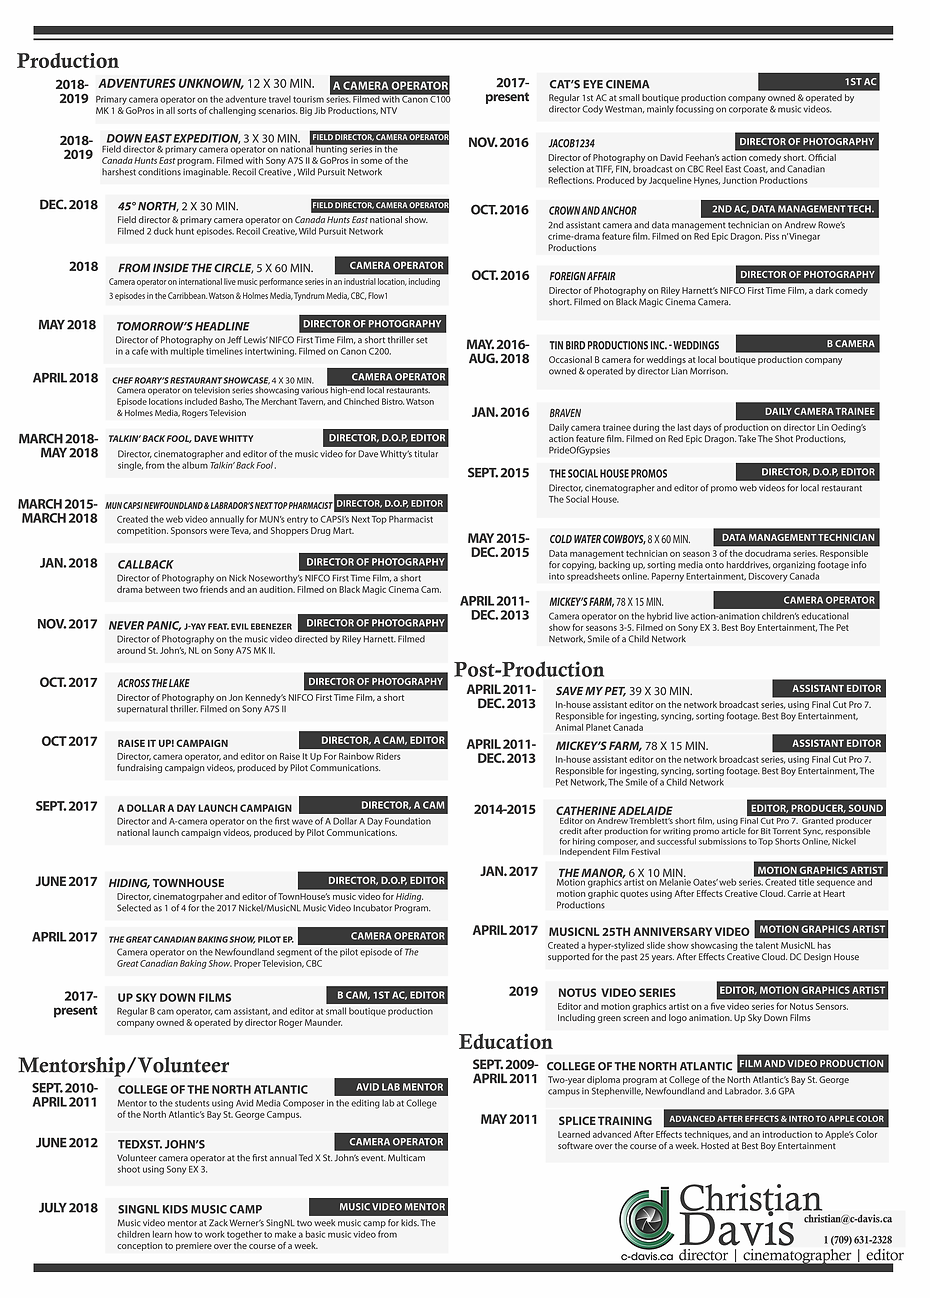 cdavis resume 0519.png